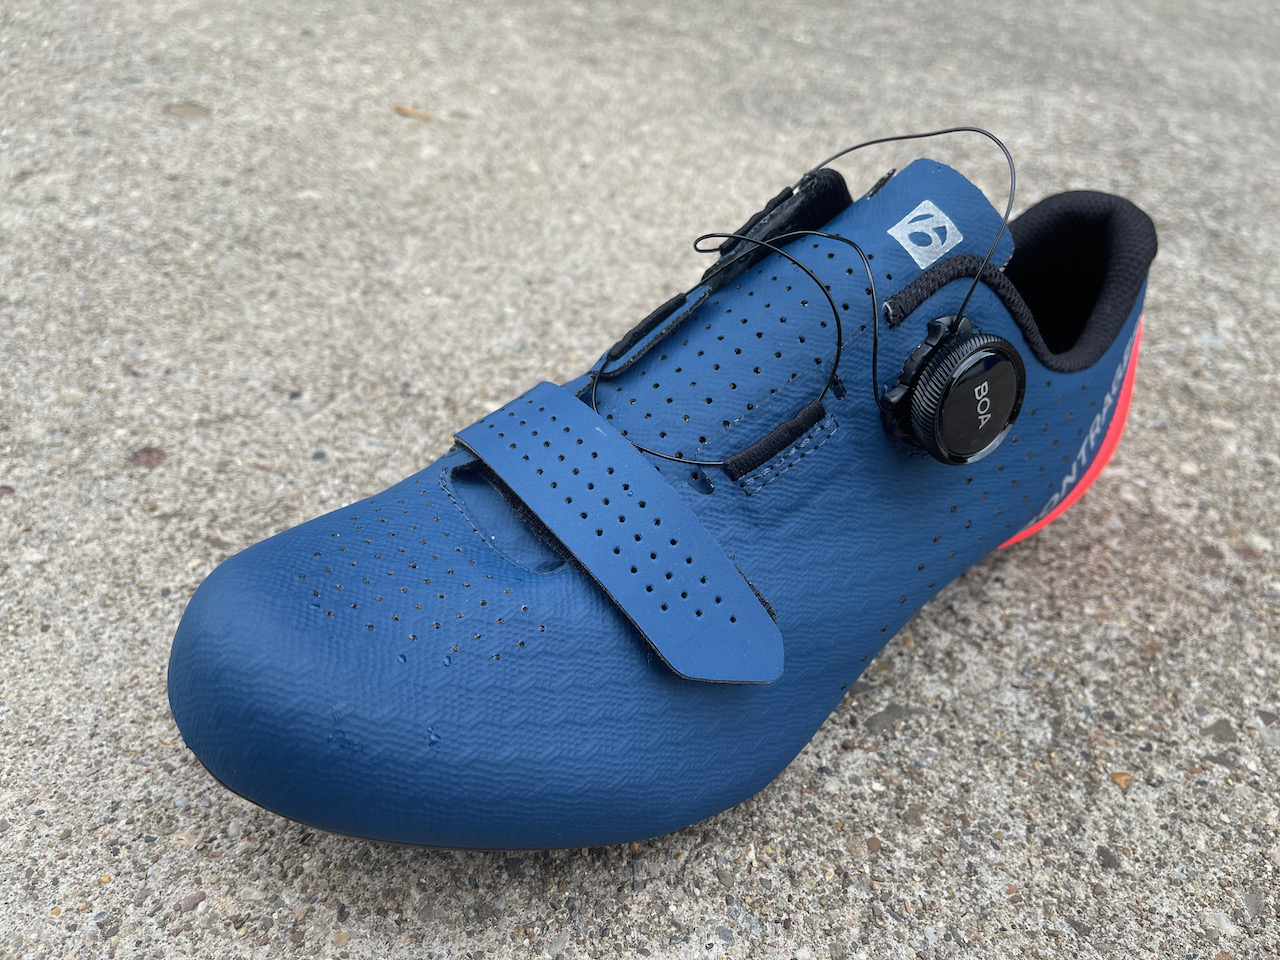 Bontrager Circuit shoe BOA undone